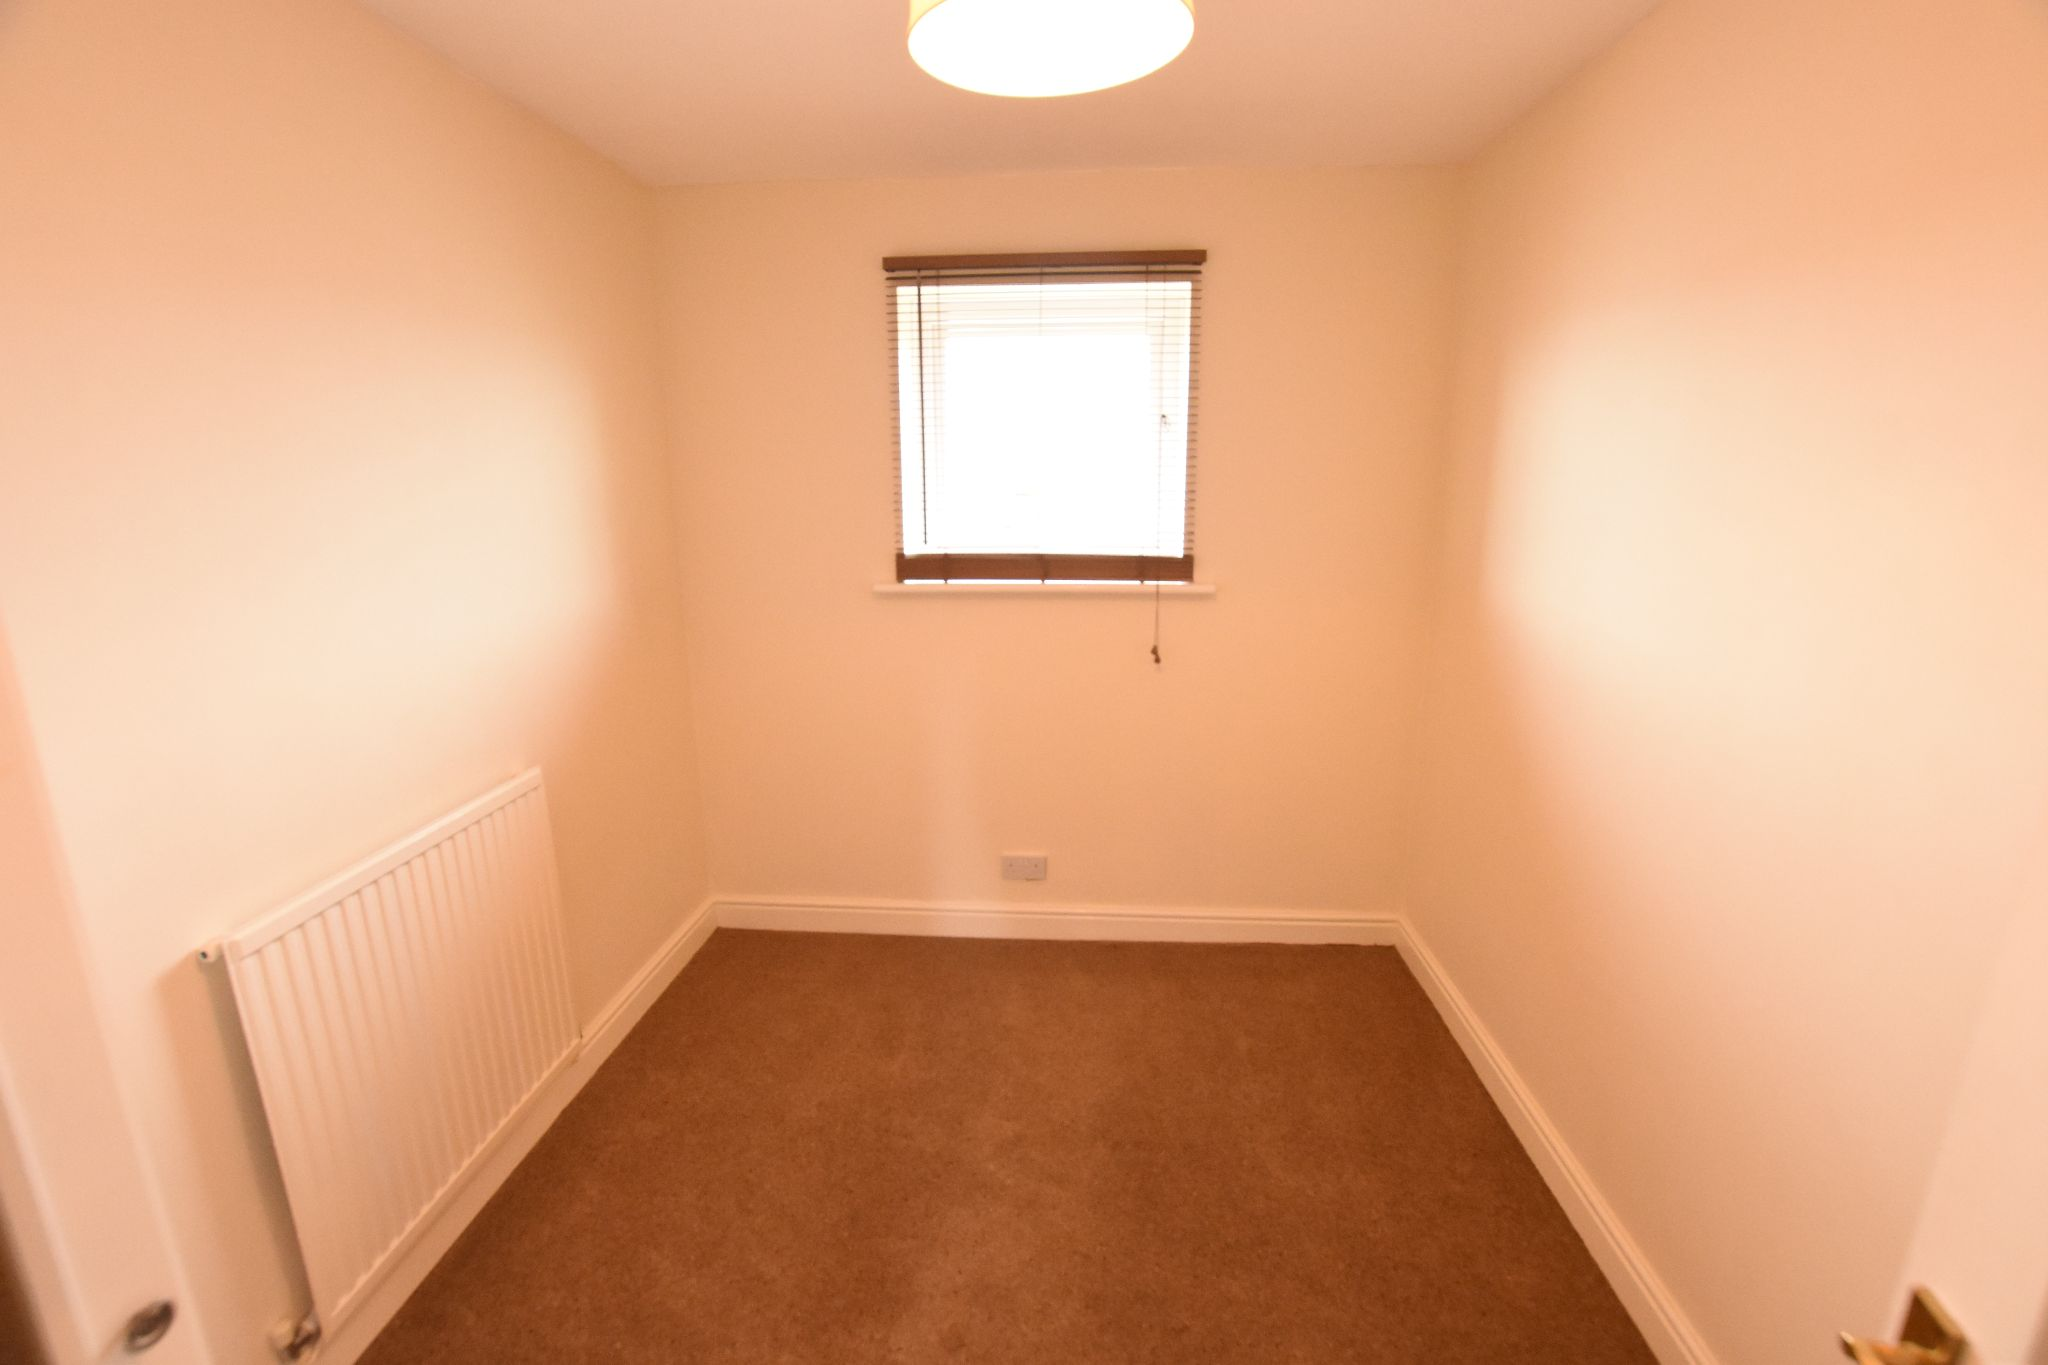 4 bedroom detached house Sold STC in Preston - Bedroom 4